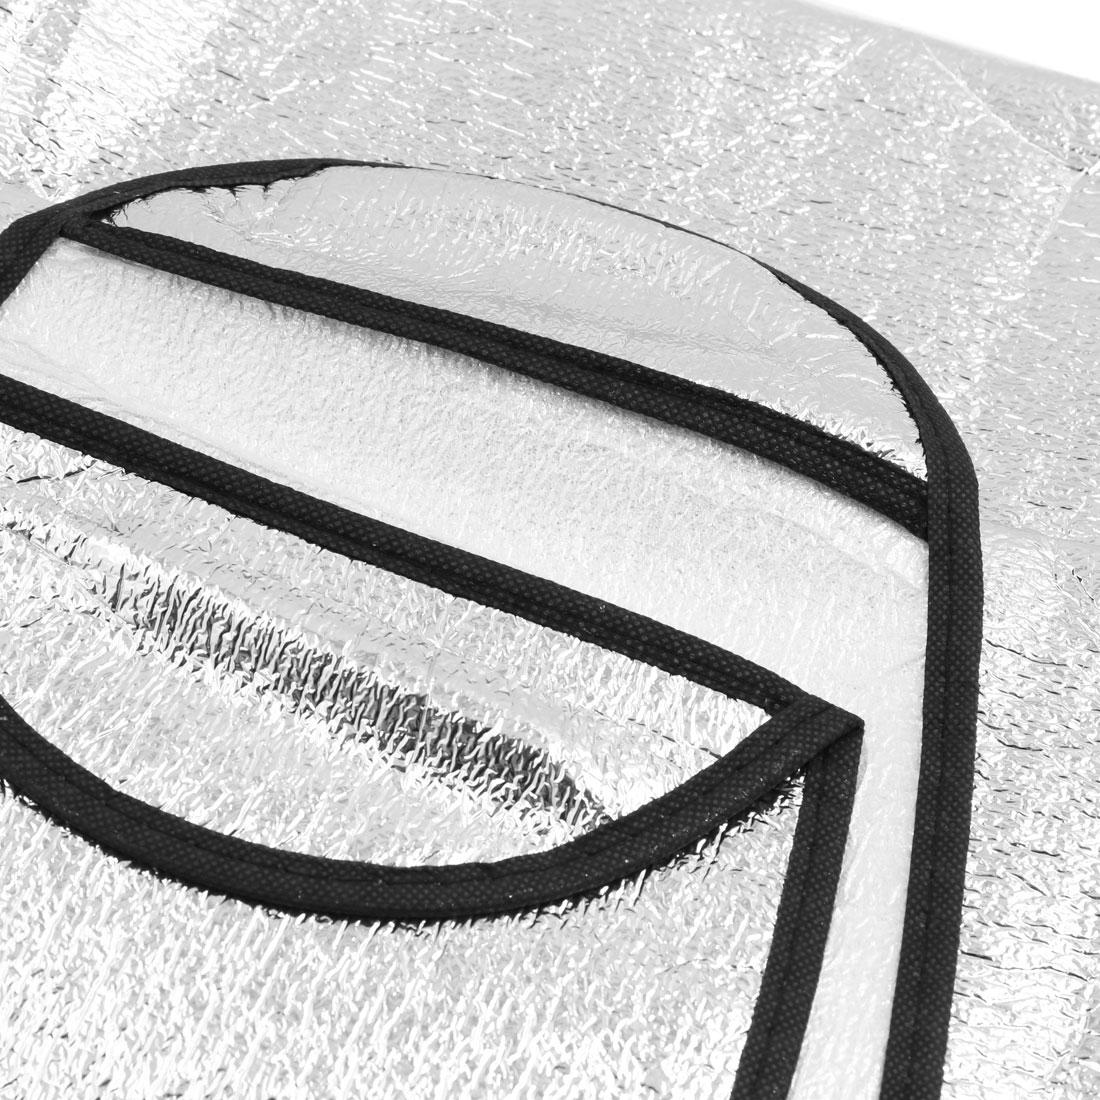 Sliver Tone Aluminum Foil Snow Heat Resistant Auto Car Windshield Sunshade - image 2 of 3